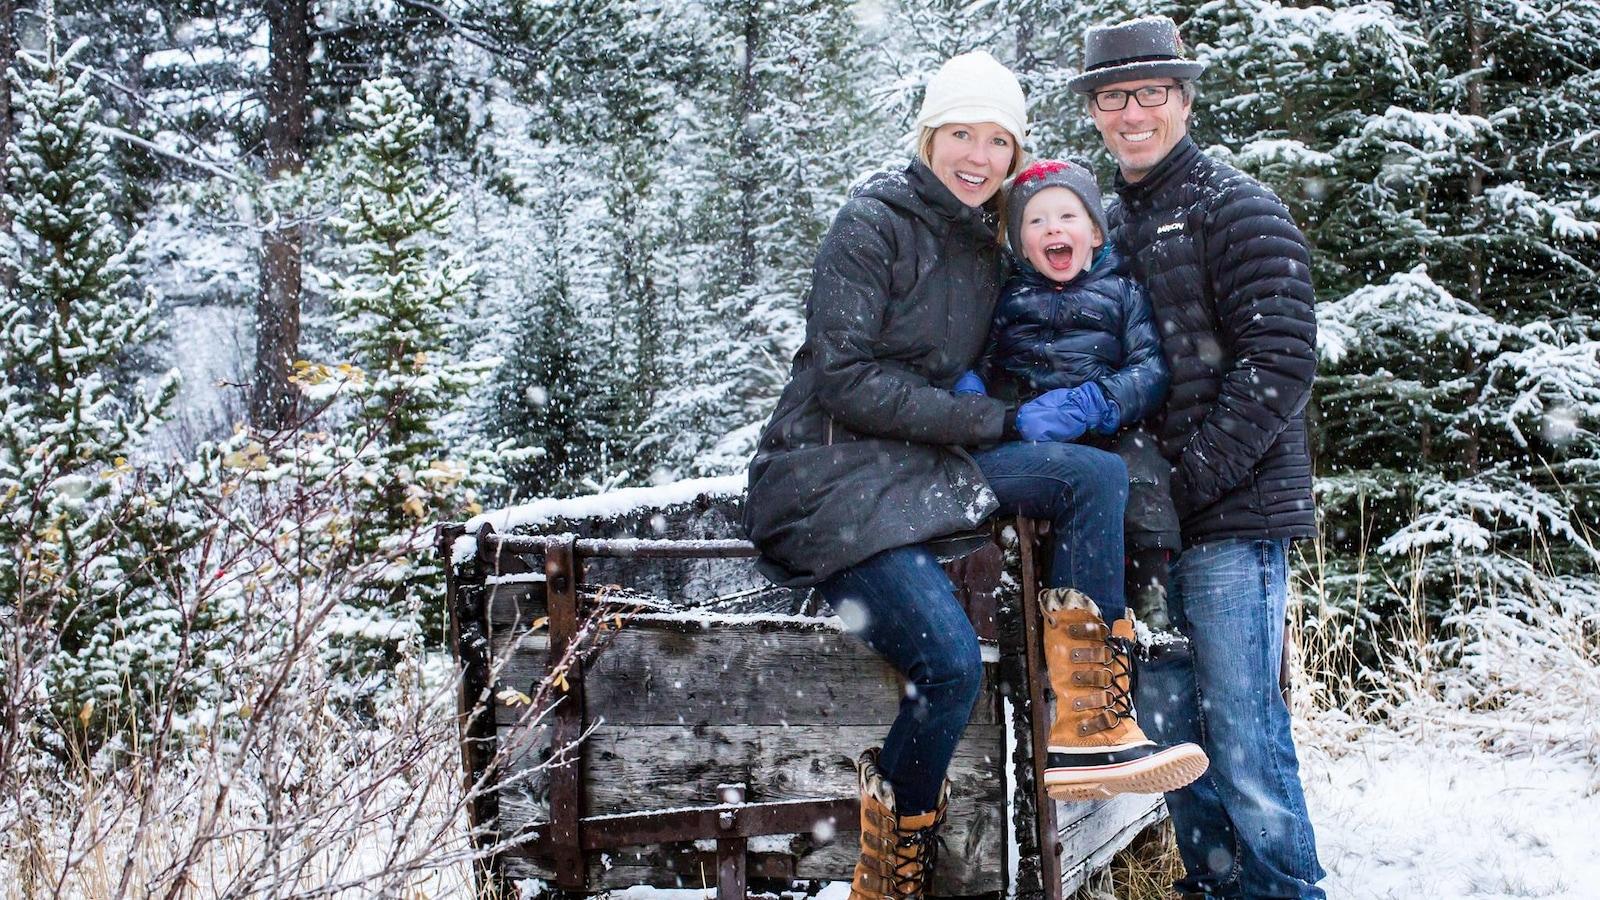 Kelly Vanderbeek entourée de sa famille